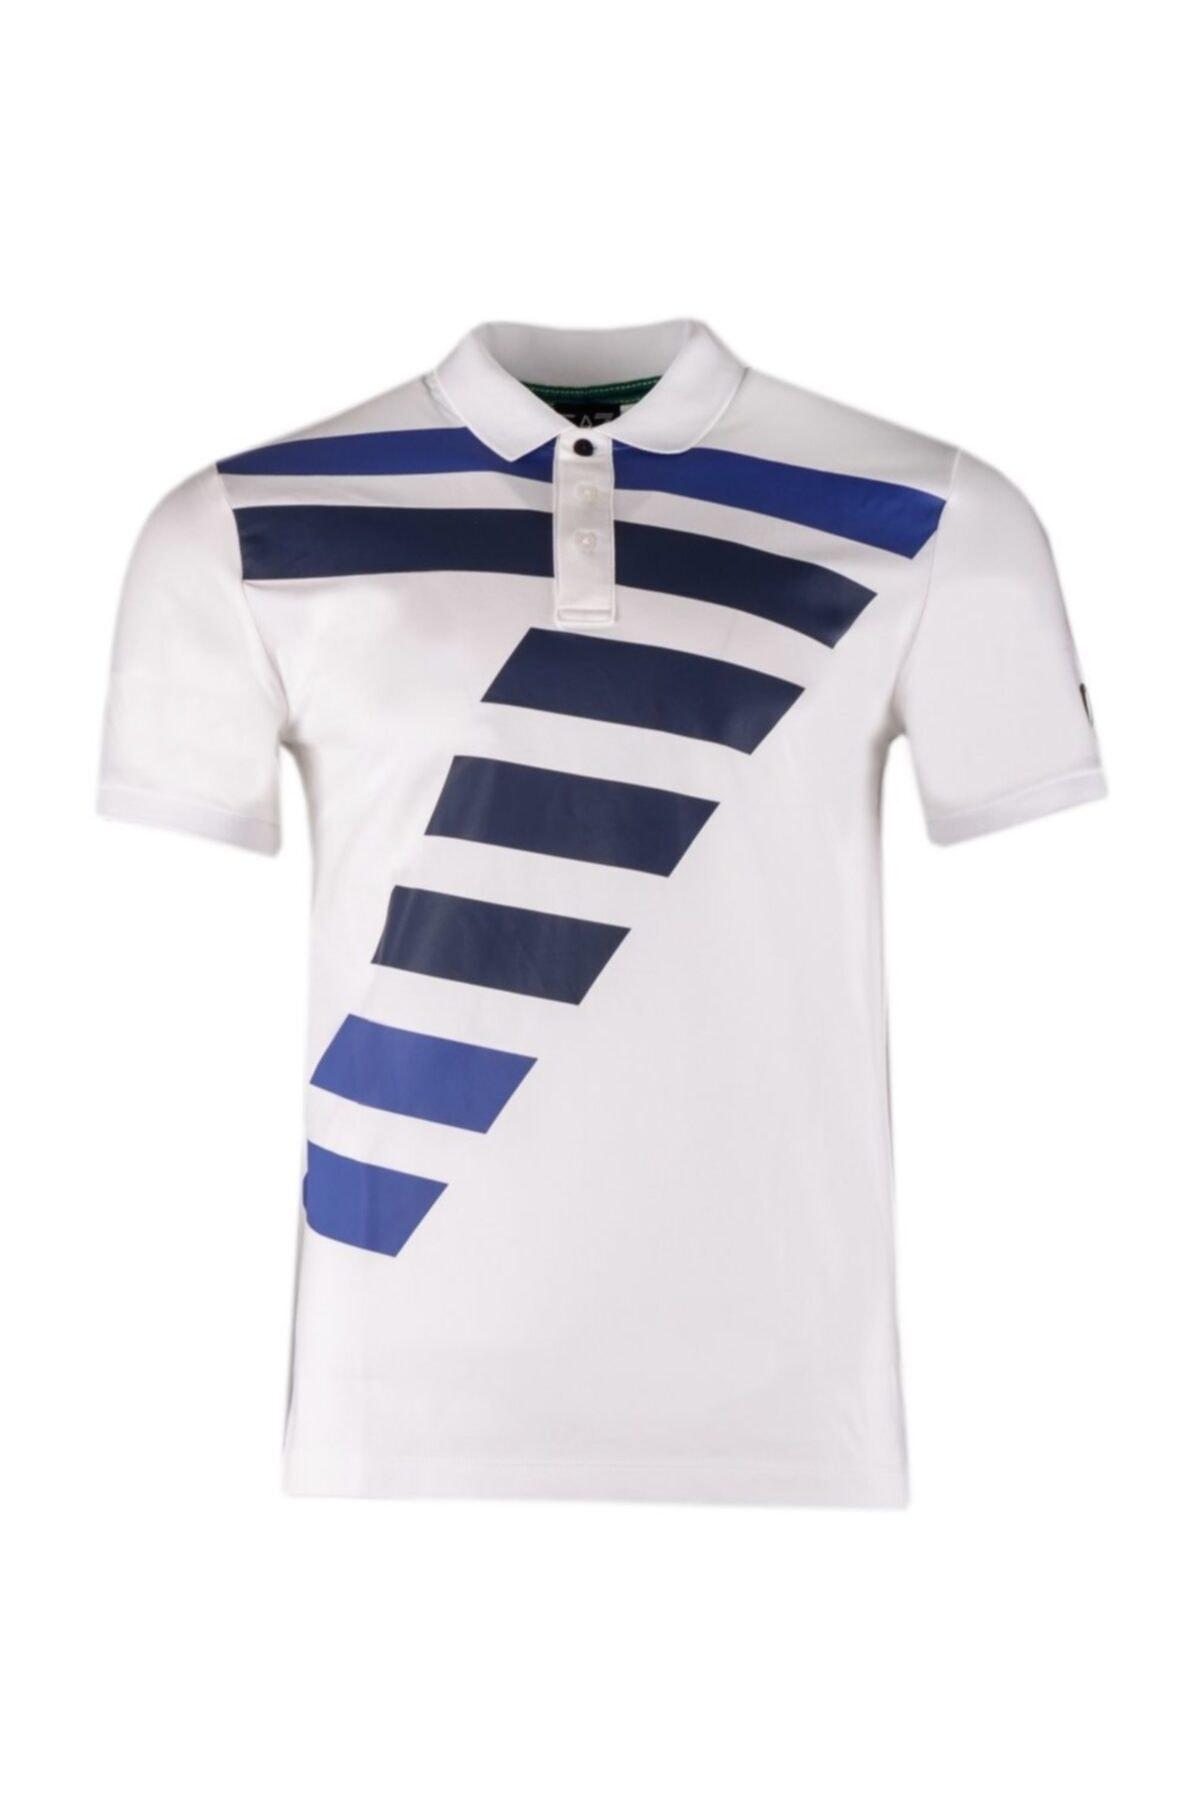 EA7 Erkek Slim Fit Polo T-shirt 3zpf81 Pj20z 1